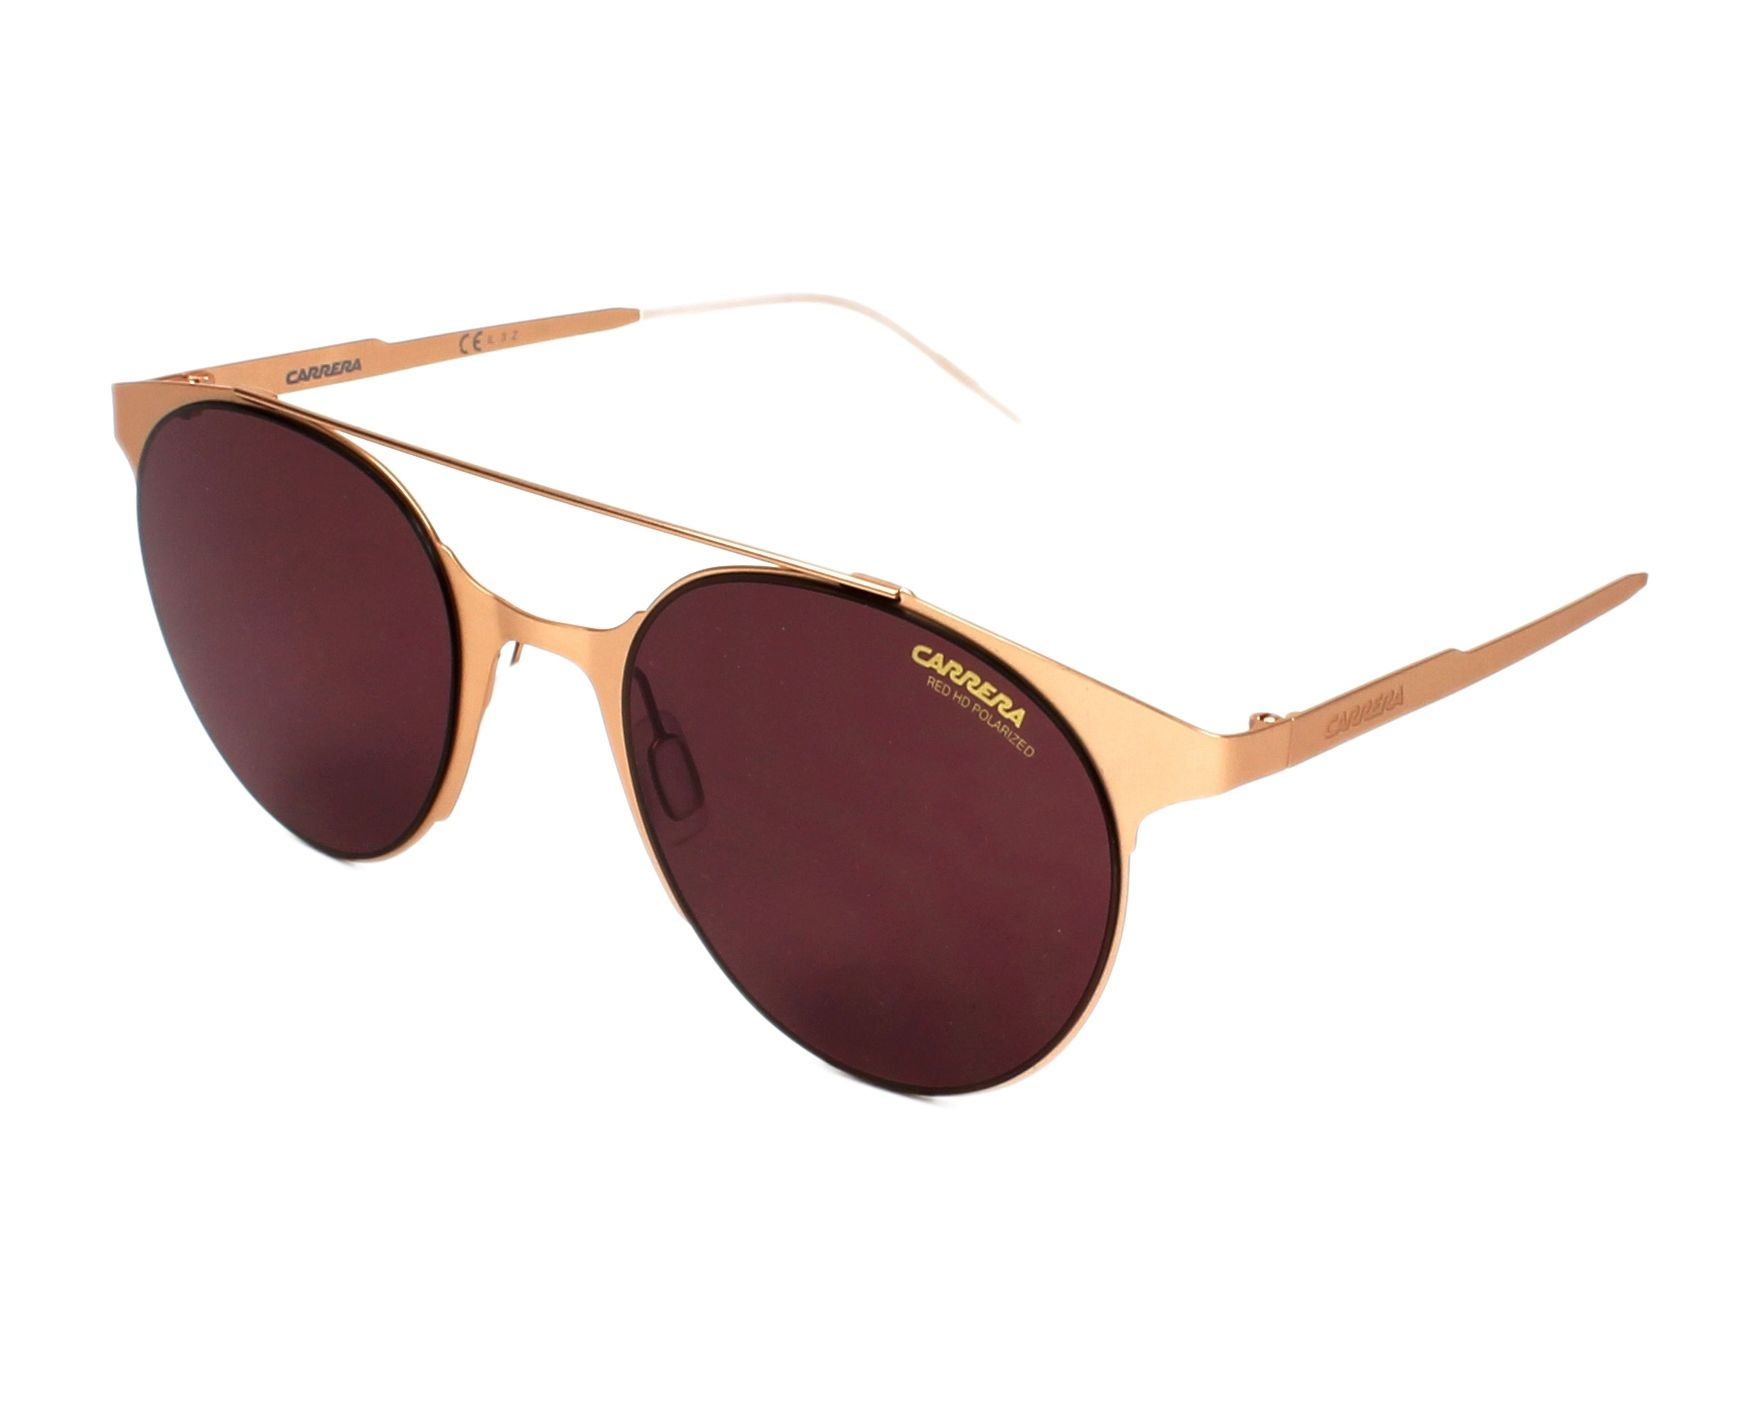 Carrera 115/S Sonnenbrille Kupfergold 03O 50mm j359dY